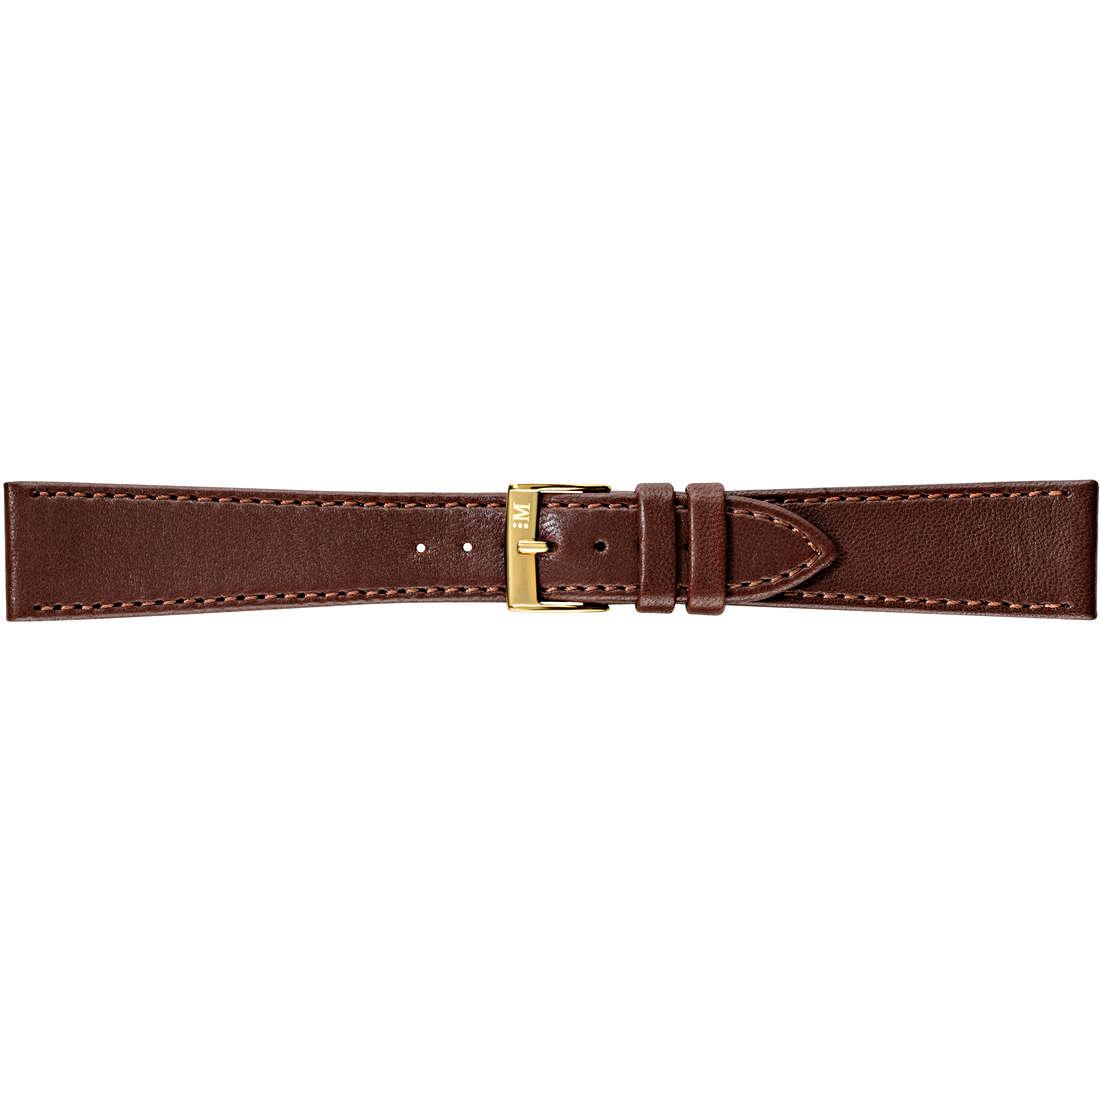 watch watch bands watch straps man Morellato Morellato 1930 A01U0770006030DO20